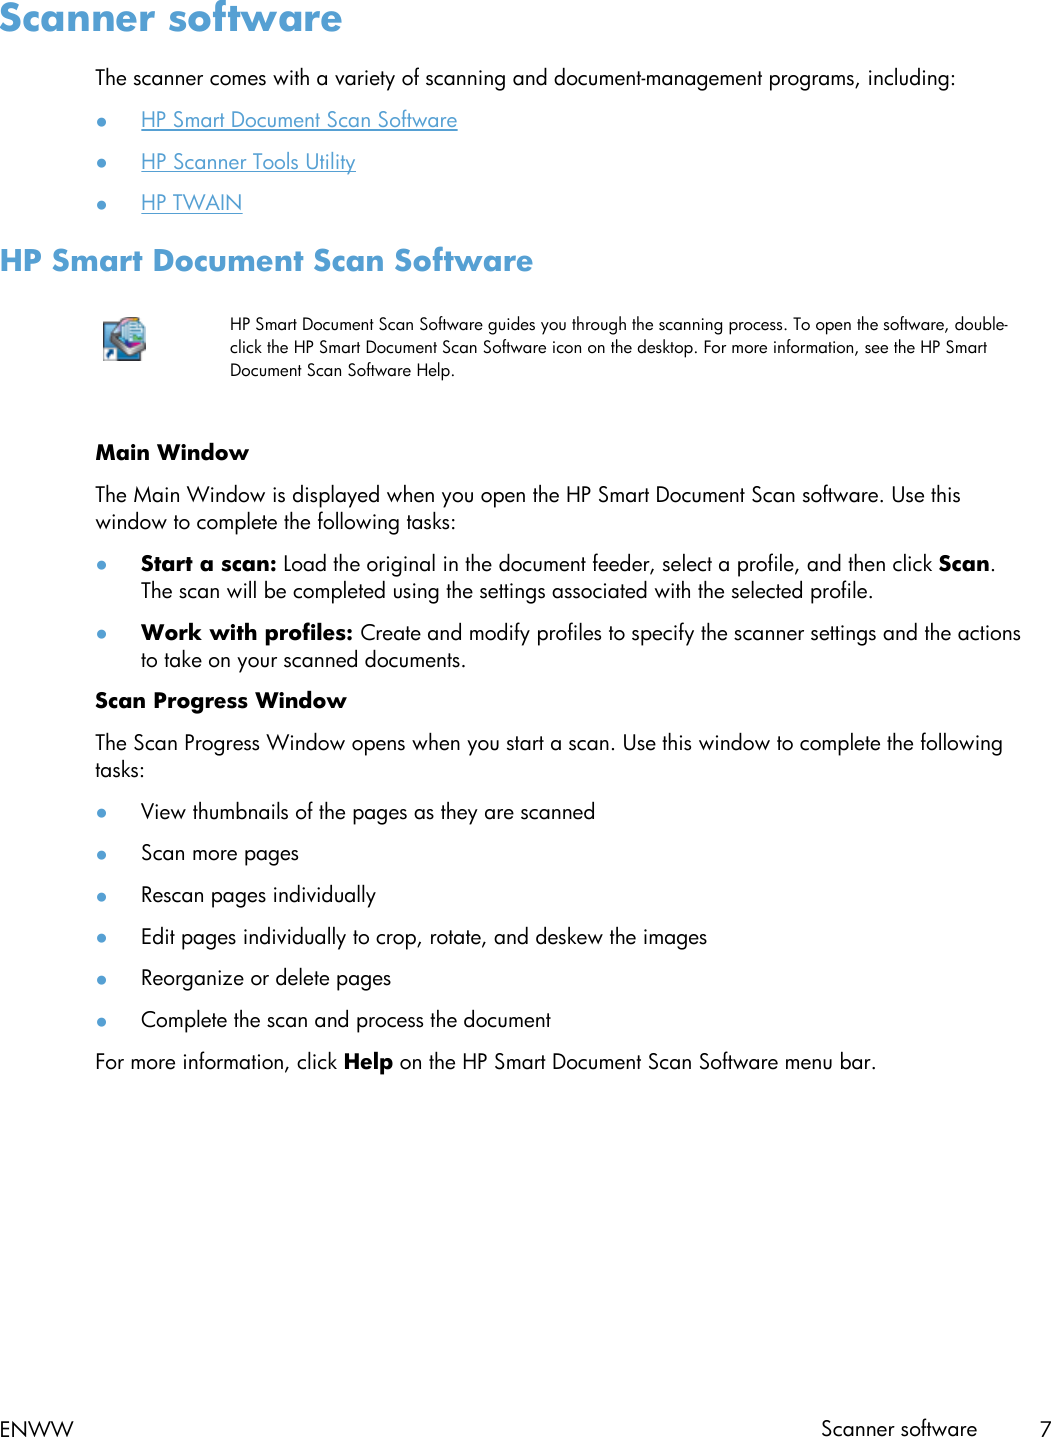 HP Scanjet Enterprise 7000 S2/Flow S2 User Guide ENWW C03144118